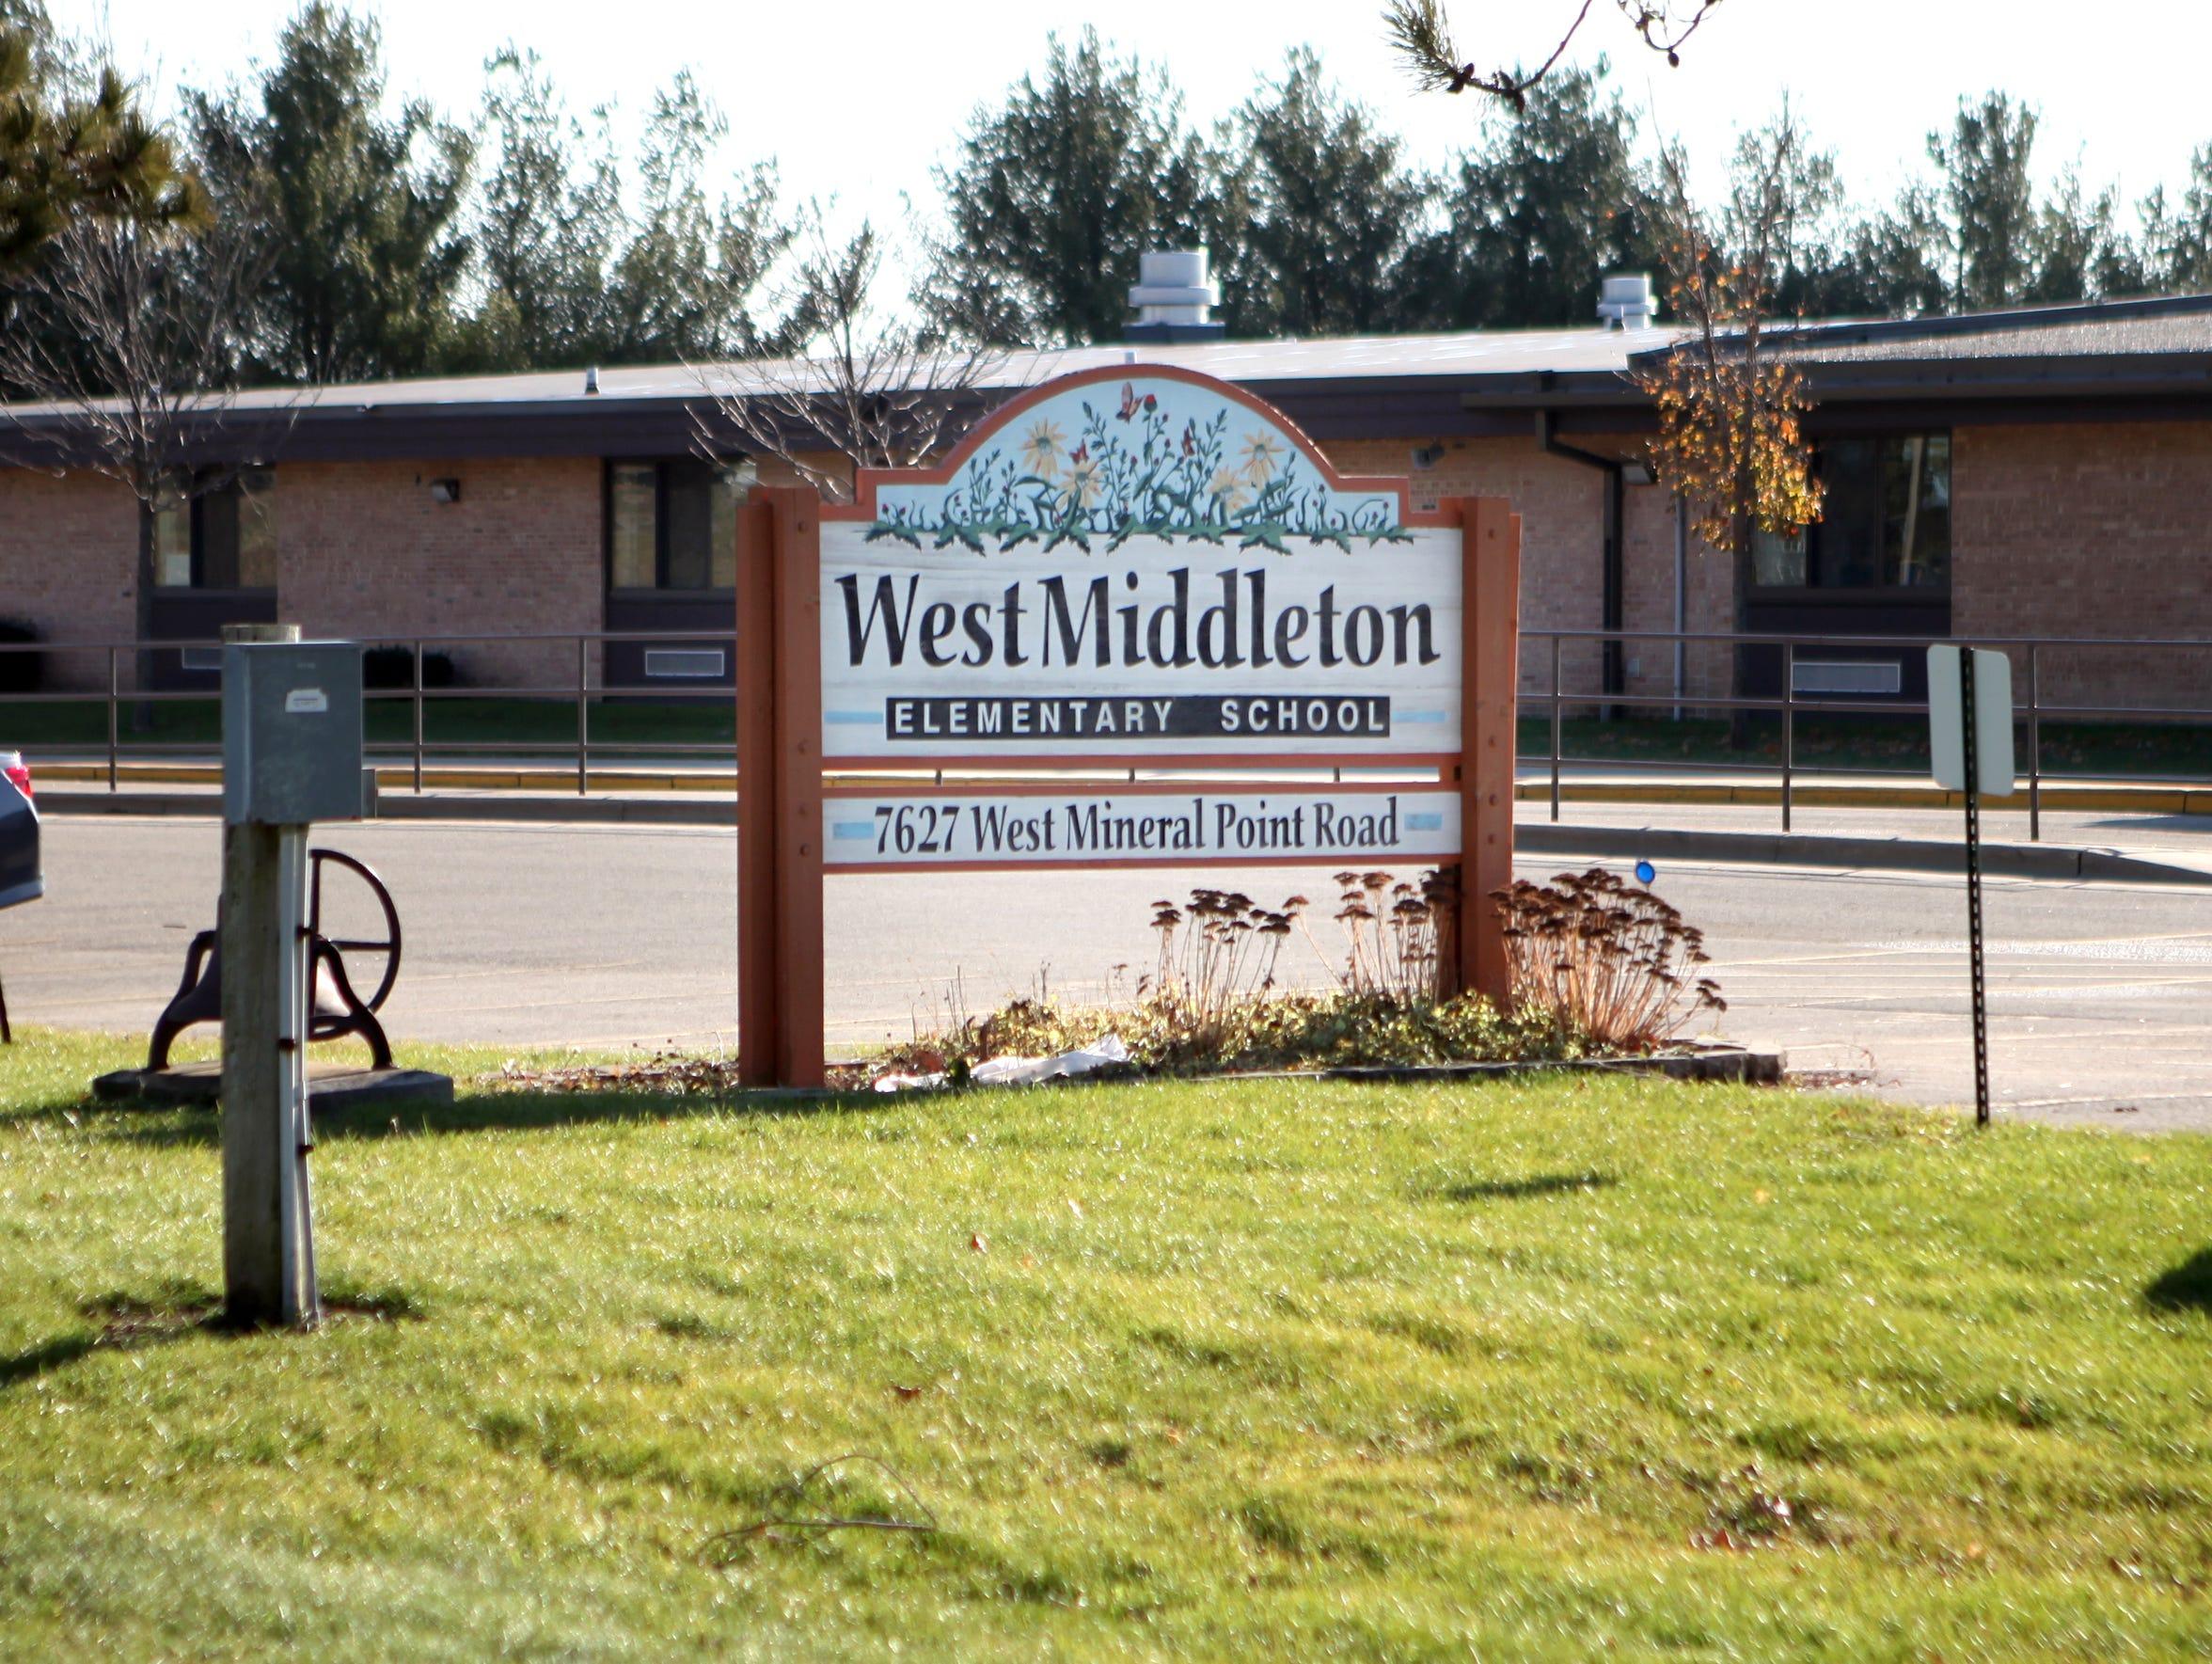 West Middleton Elementary School west of Madison found